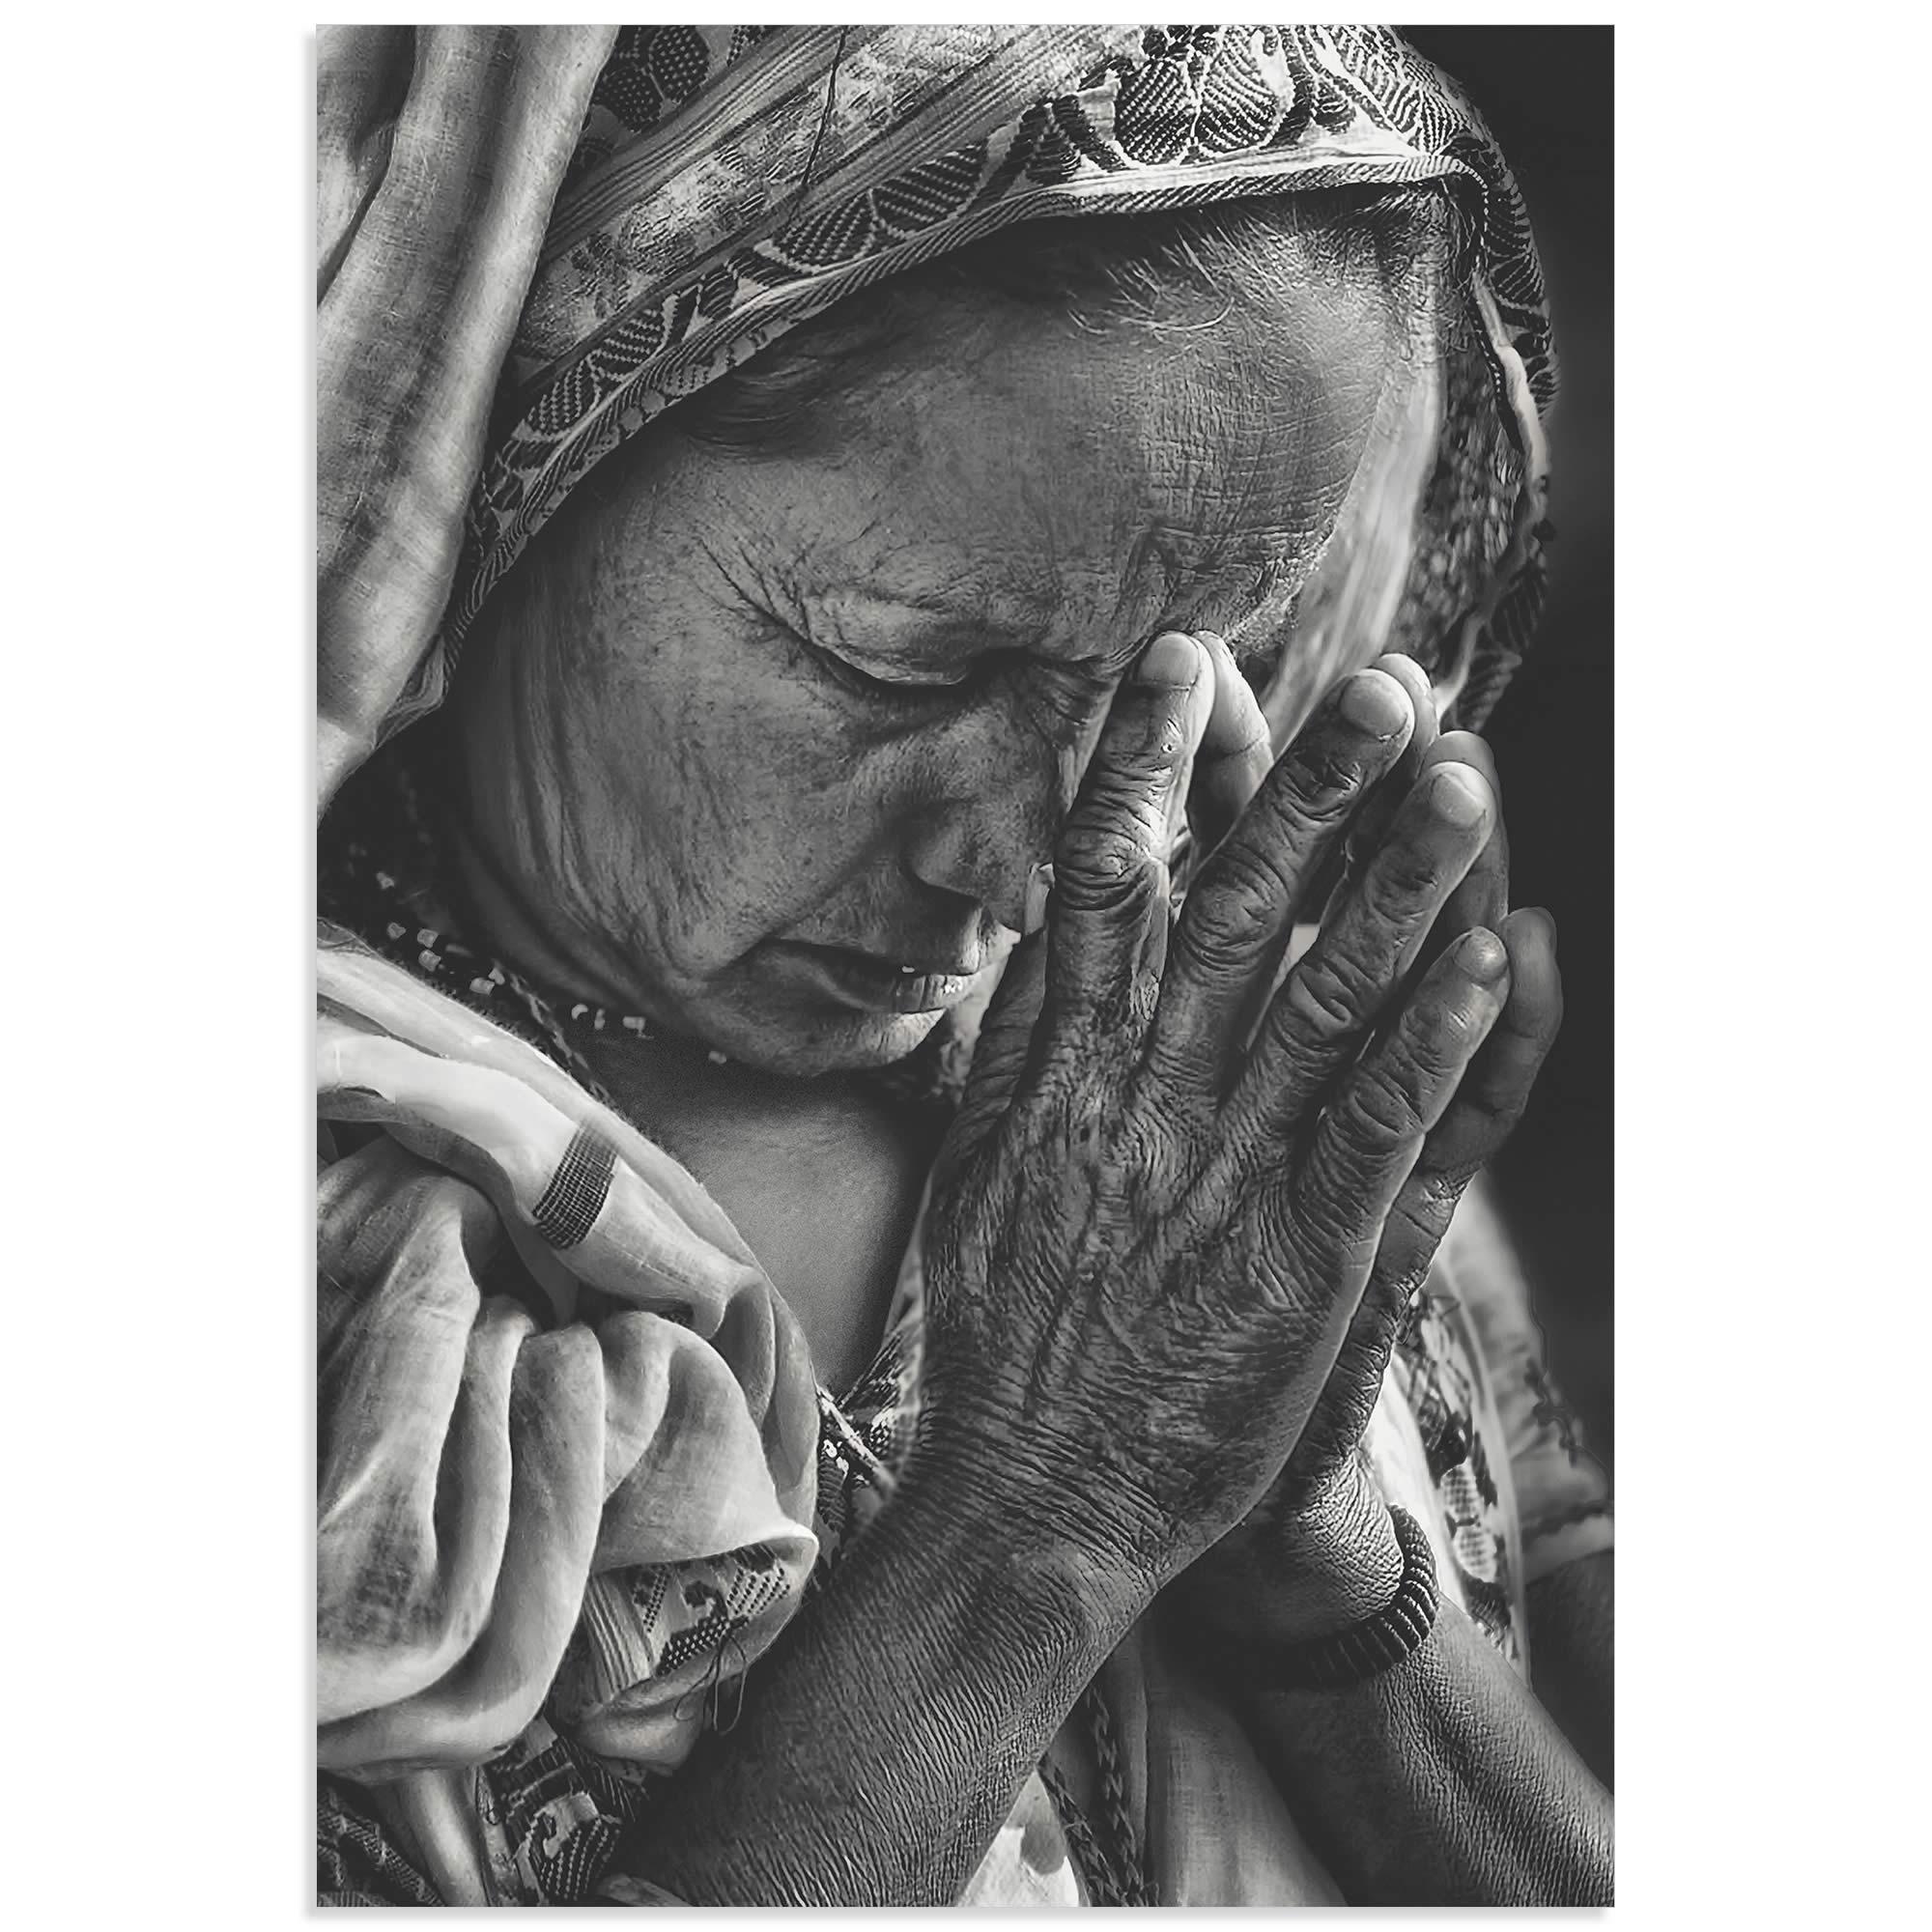 Prayers by Piet Flour - Hindu Prayer Art on Metal or Acrylic